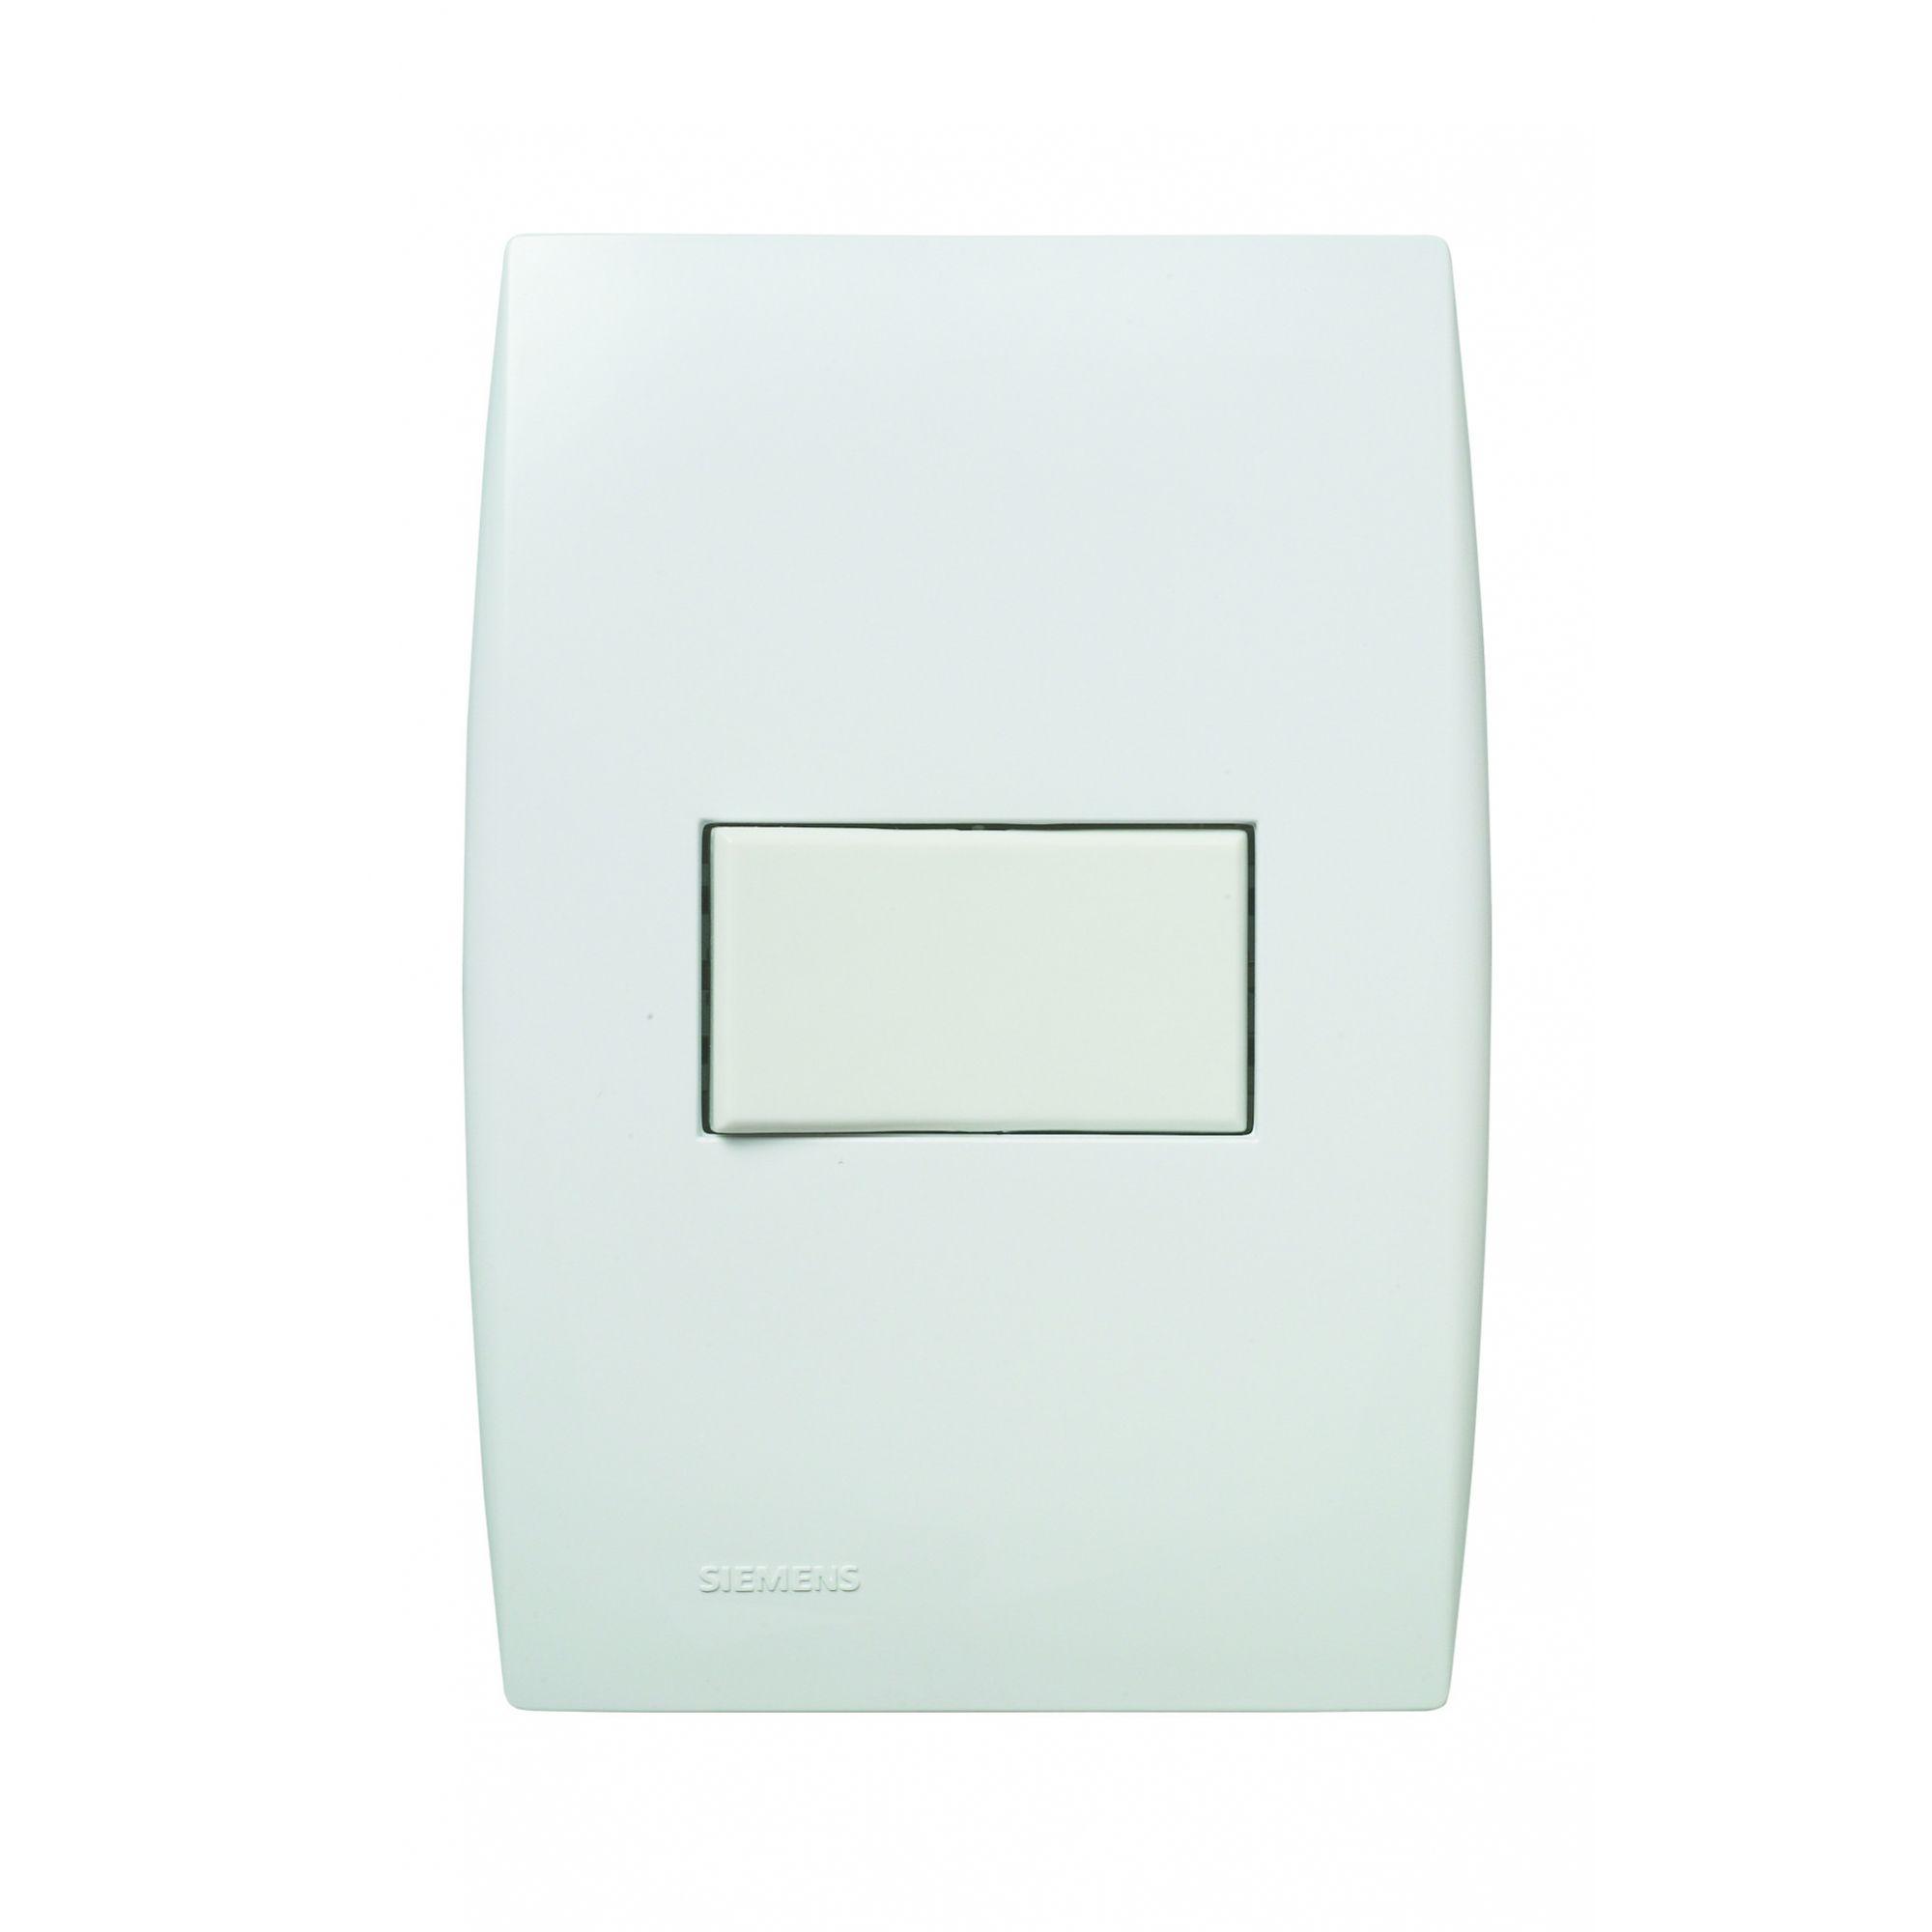 Interruptor paralelo (Horizontal) – Ilus 5TA9 9042 - Siemens